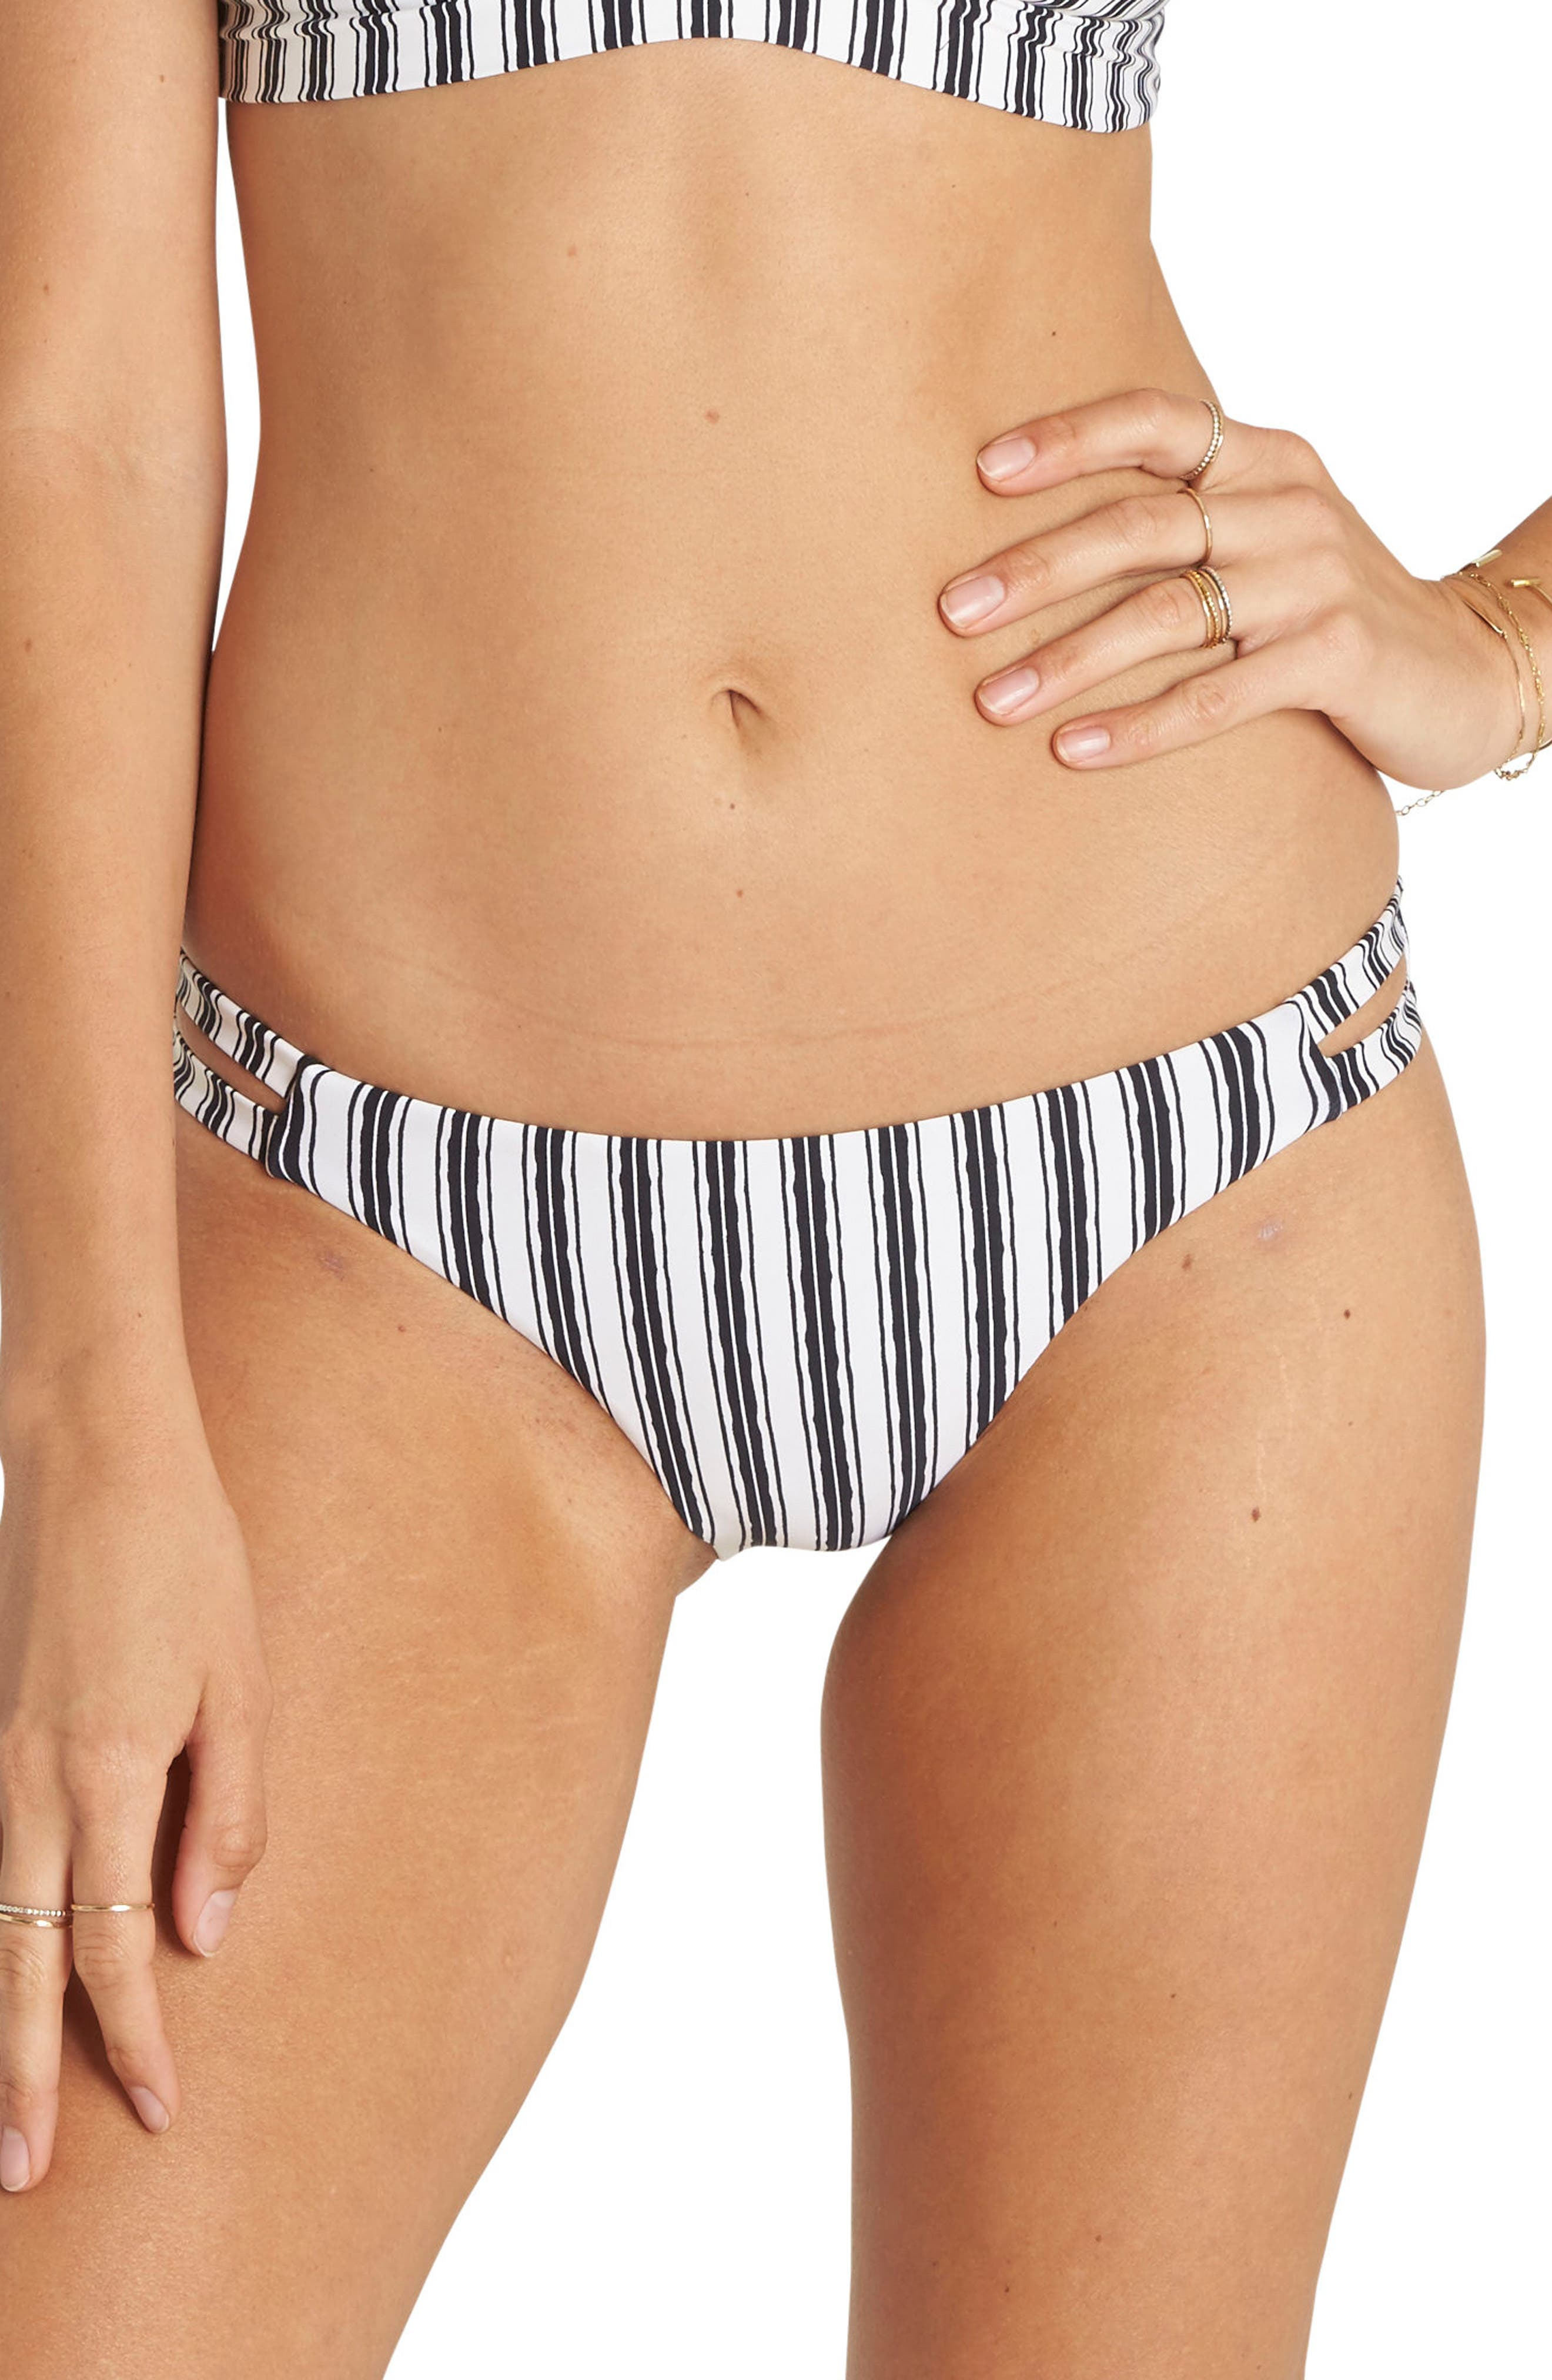 Get in Line Lowrider Bikini Bottoms,                             Main thumbnail 1, color,                             001